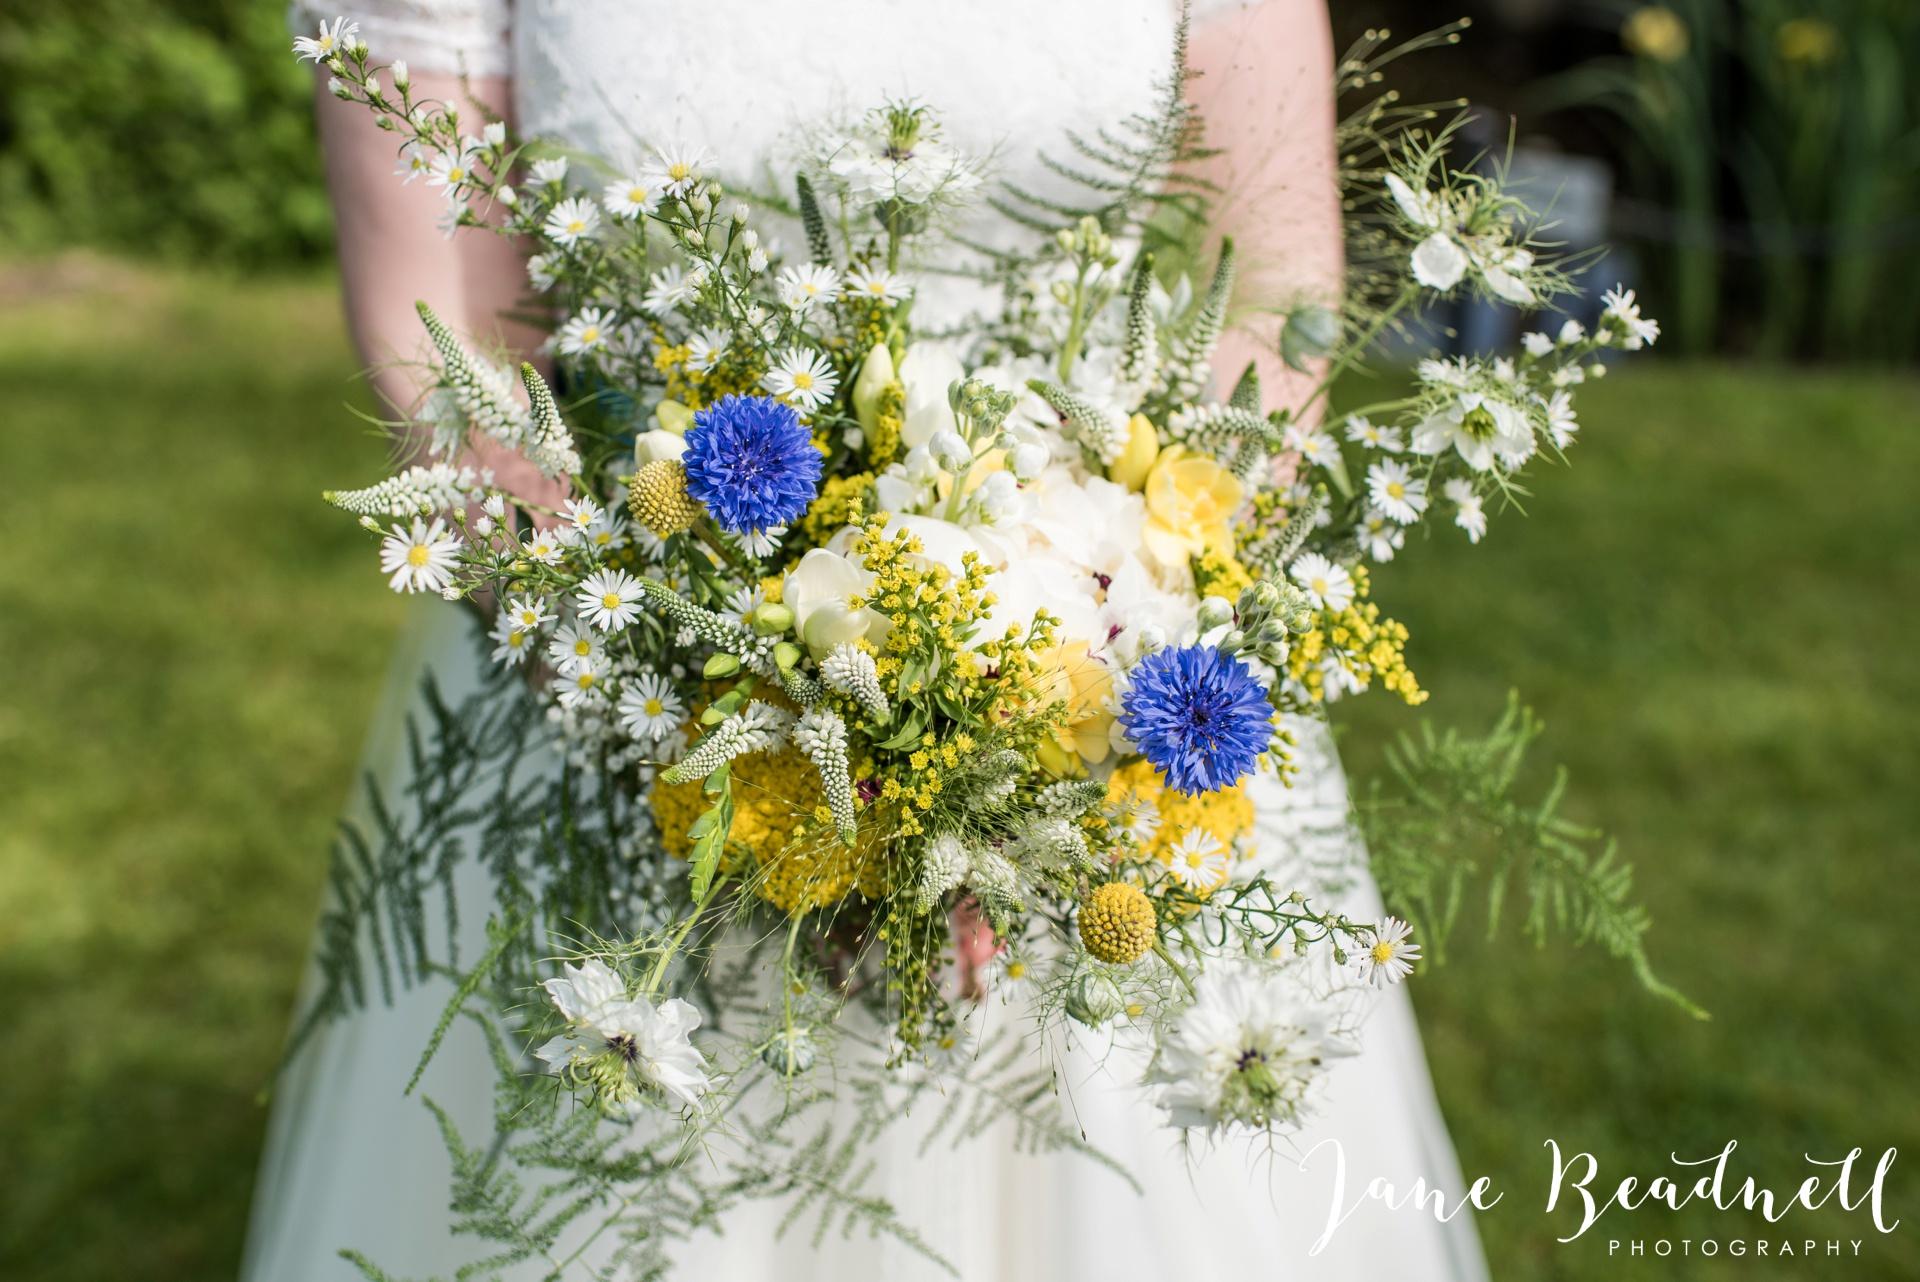 South Farm Wedding photography Hertfordshire by Jane Beadnell Photography fine art wedding photographer_0094